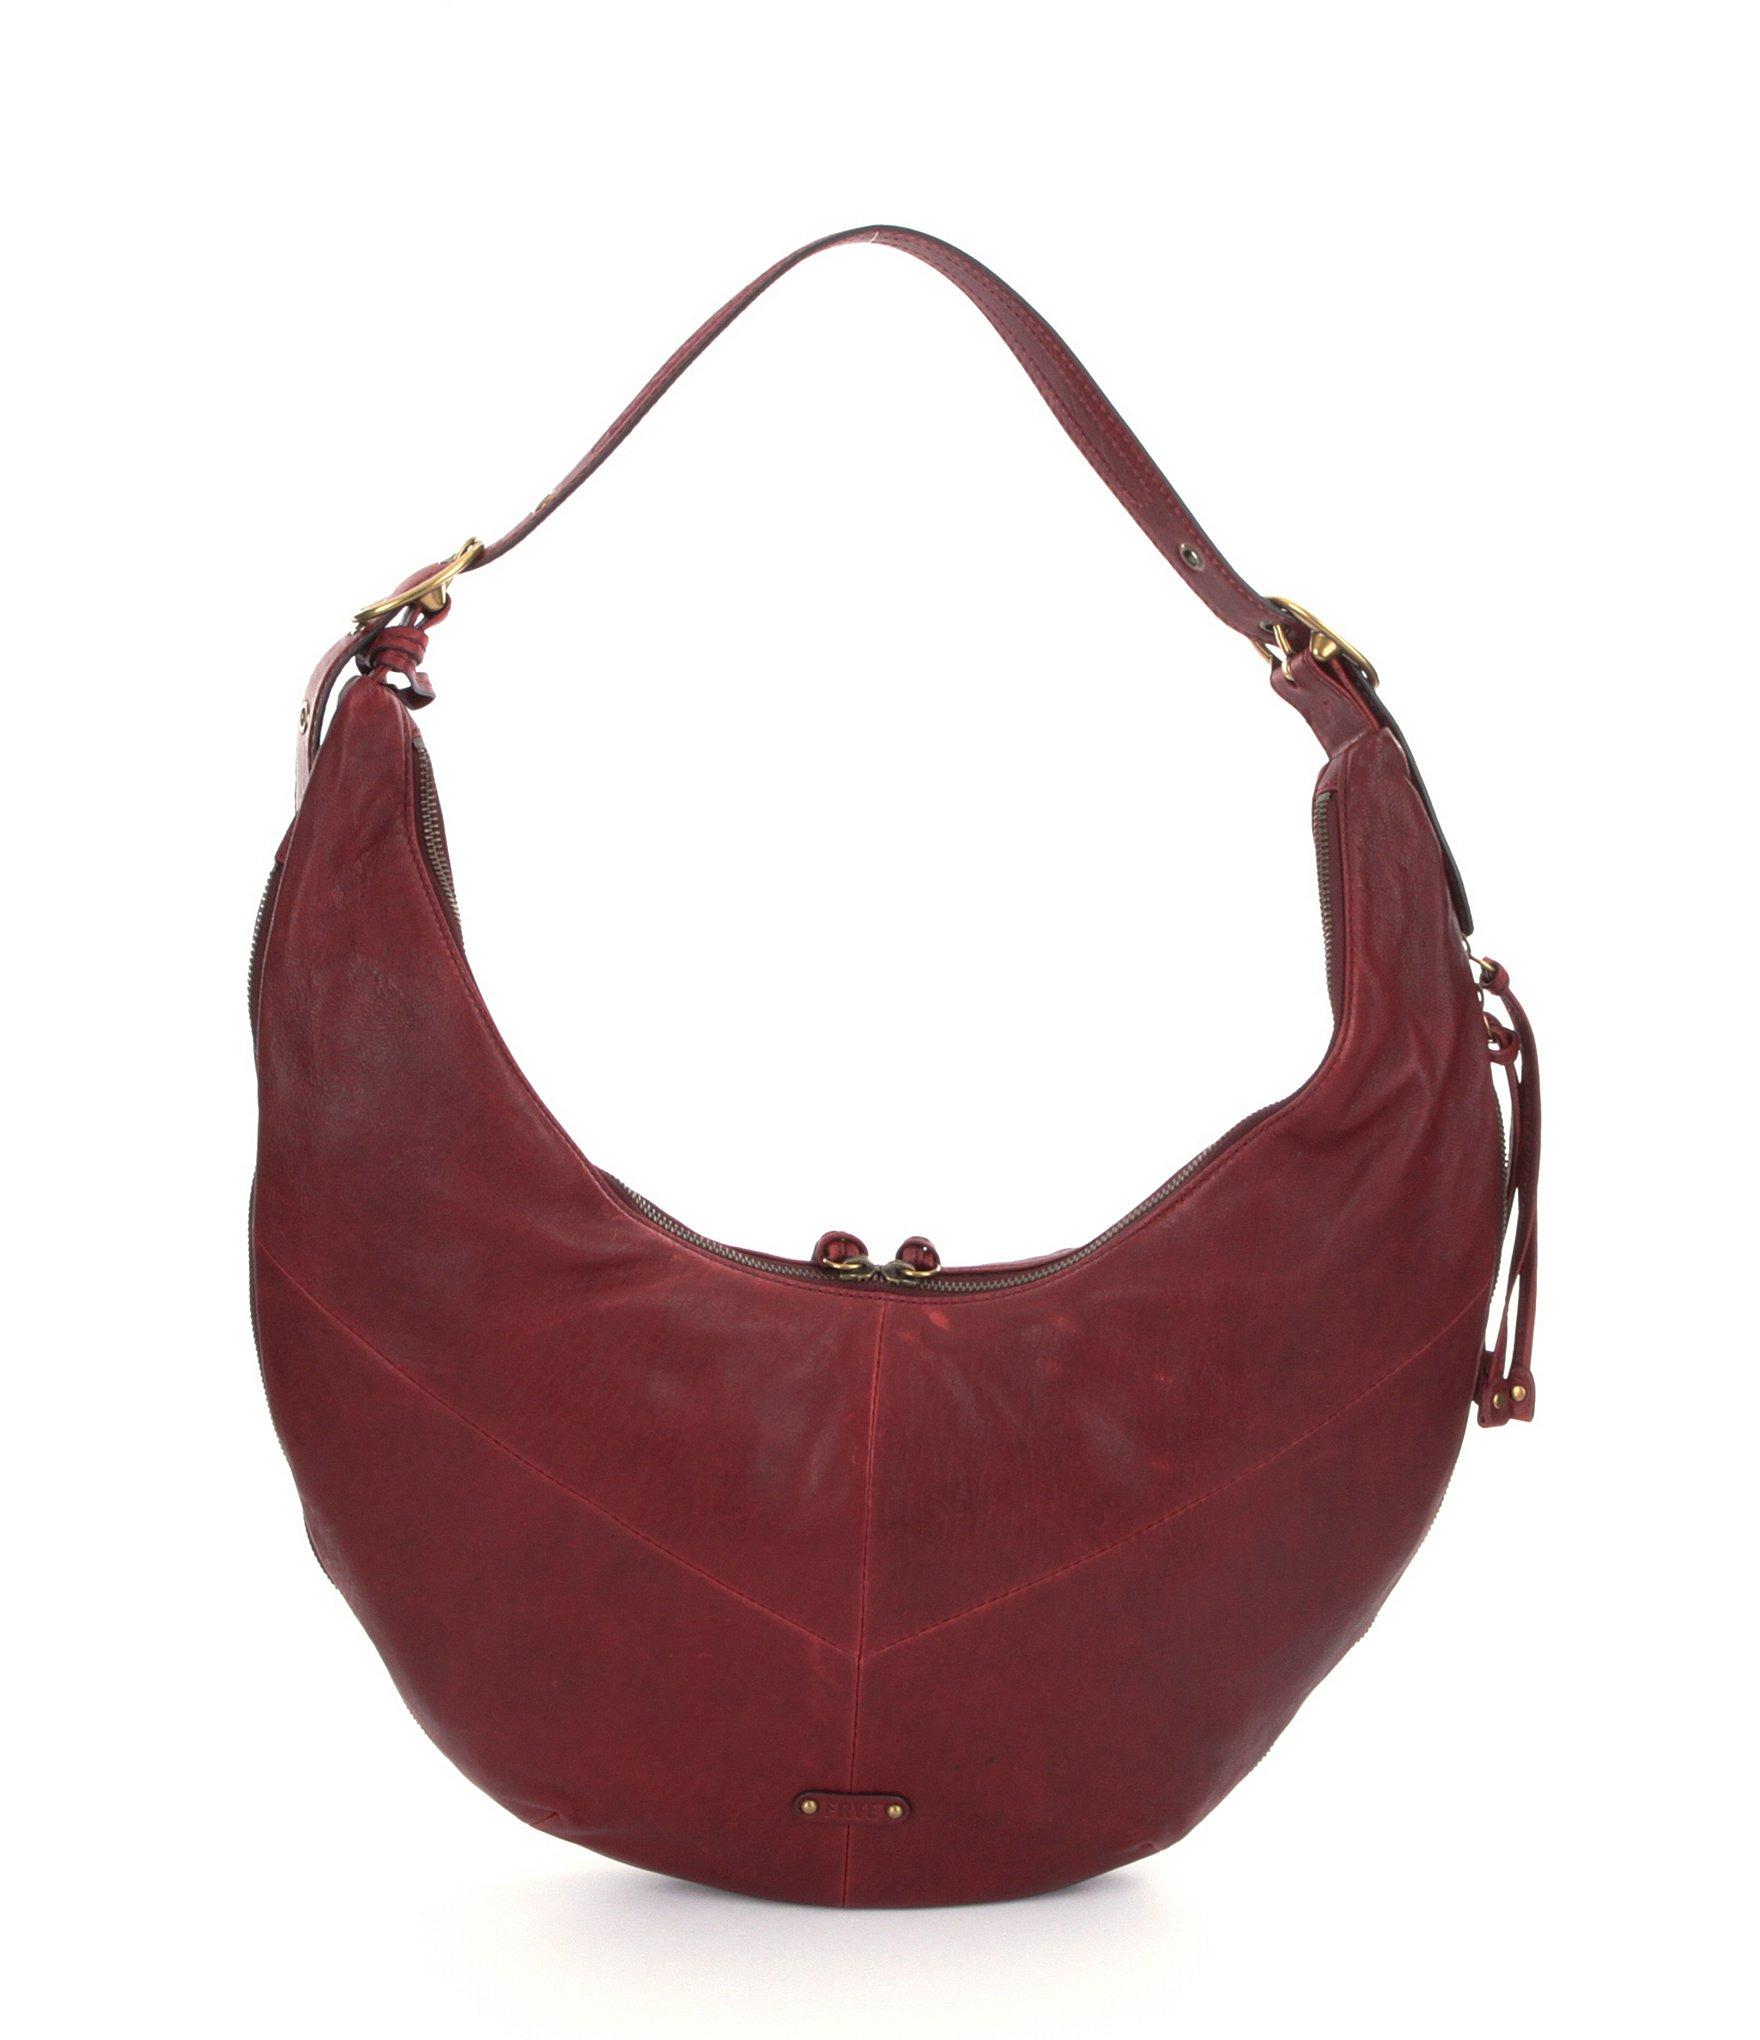 Lyst - Frye Belle Bohemian Hobo Bag in Red 634b2df72d3d8